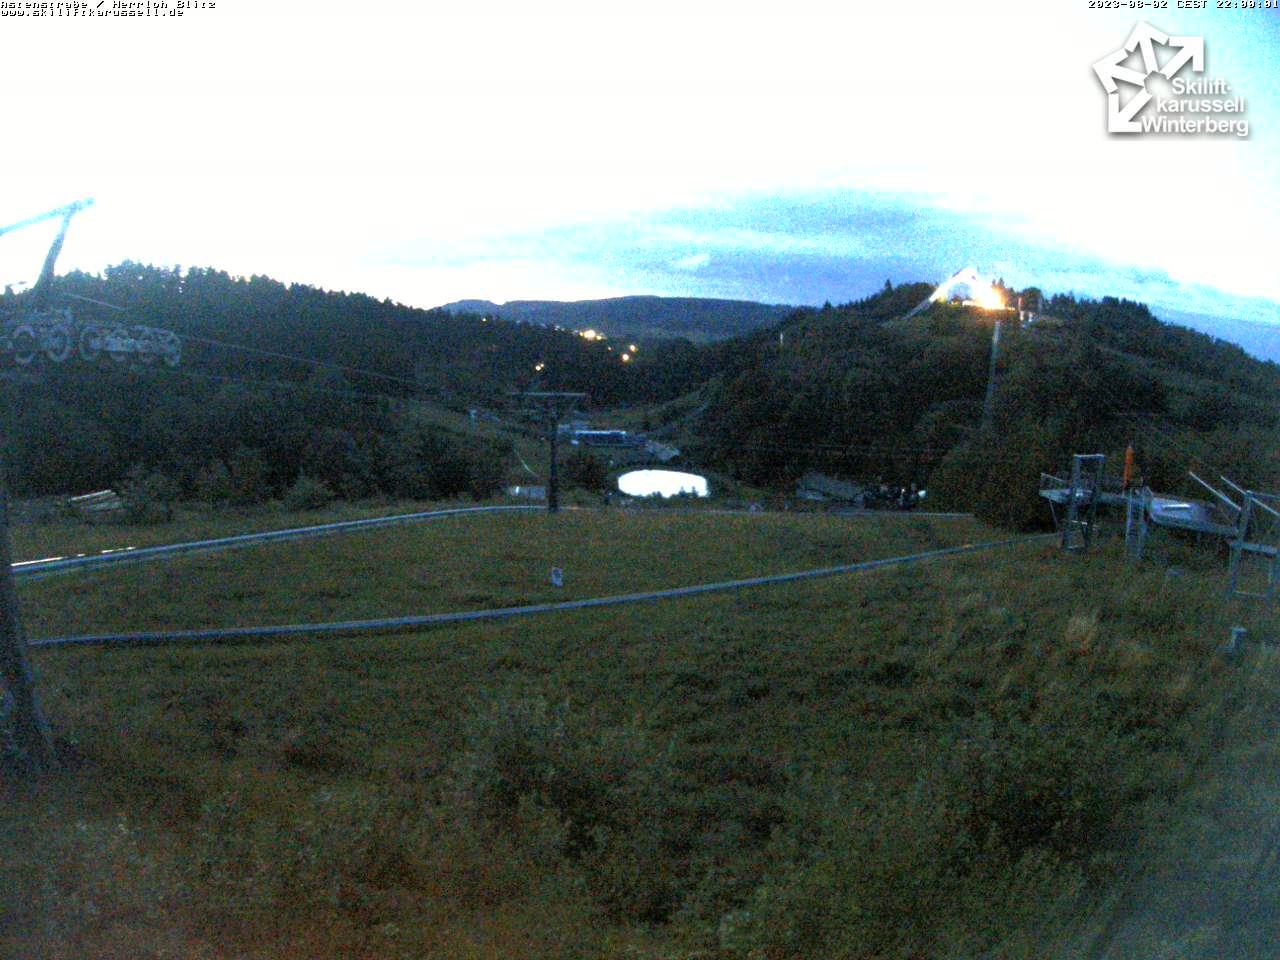 Webcam Astenstrasse / Herrloh Blitz - Skiliftkarussell Winterberg